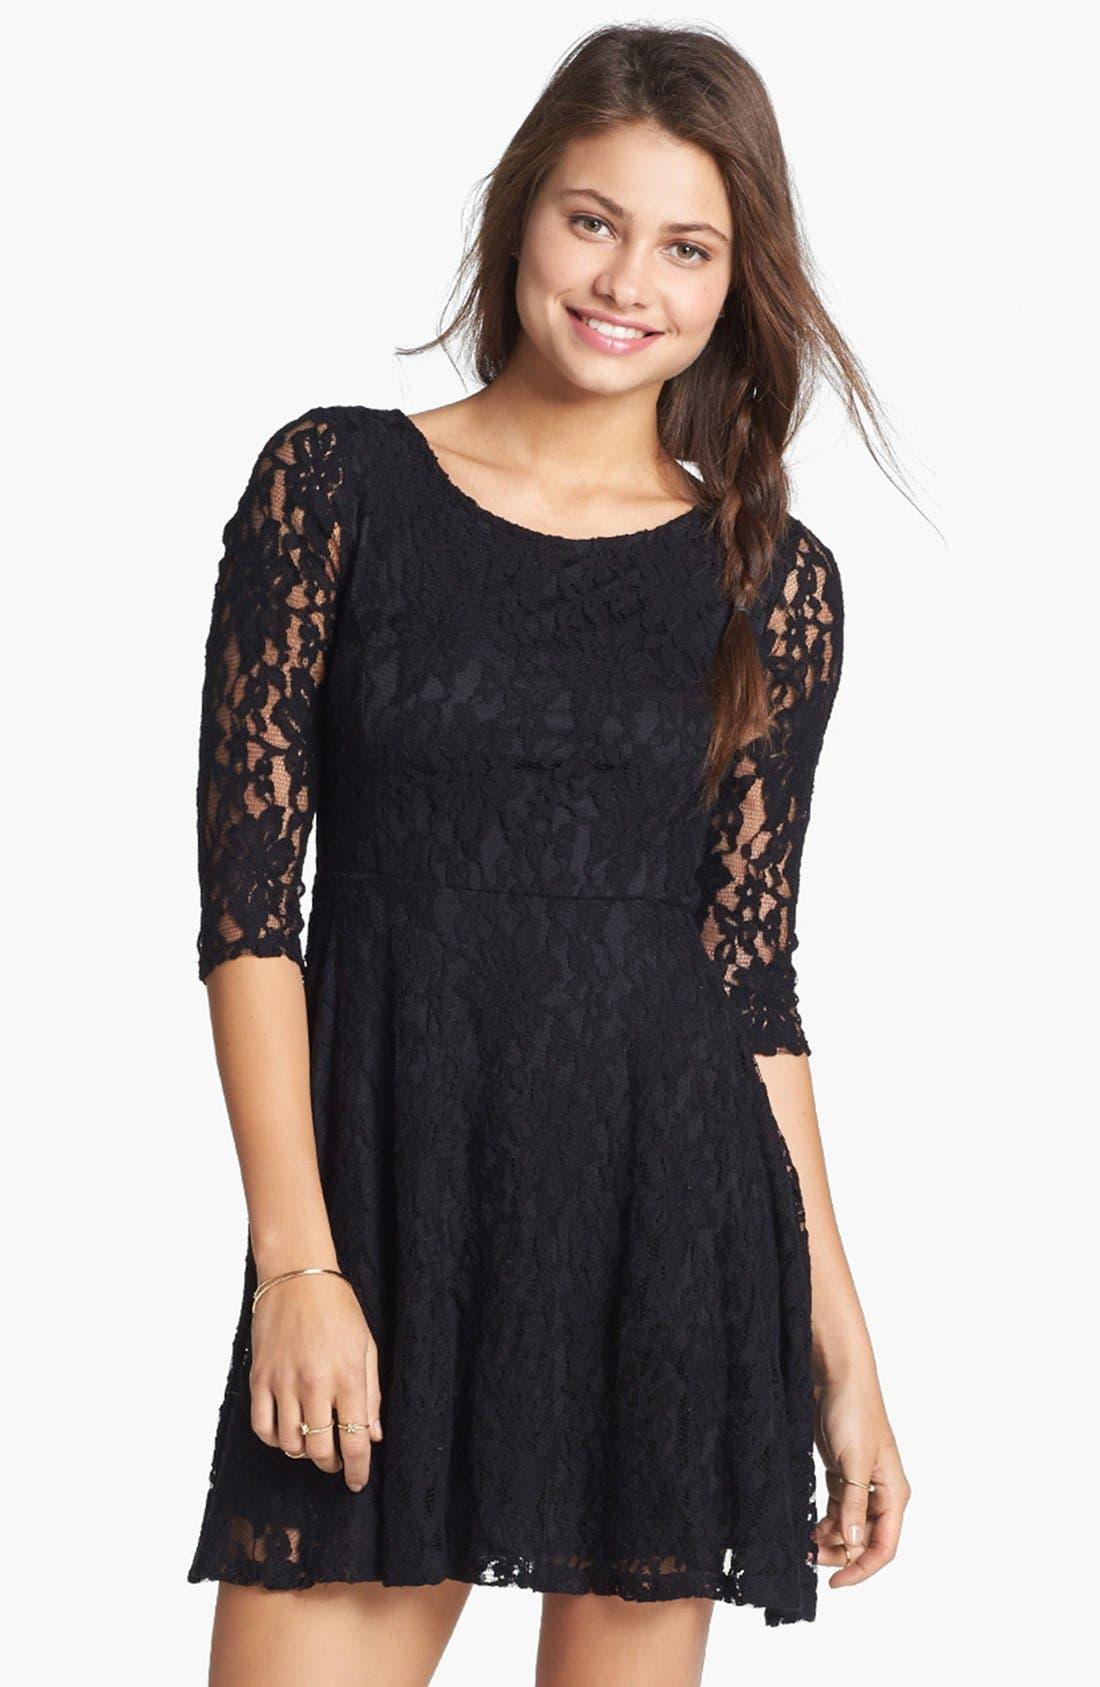 Alternate Image 1 Selected - Lush Three Quarter Sleeve Lace Skater Dress (Juniors)